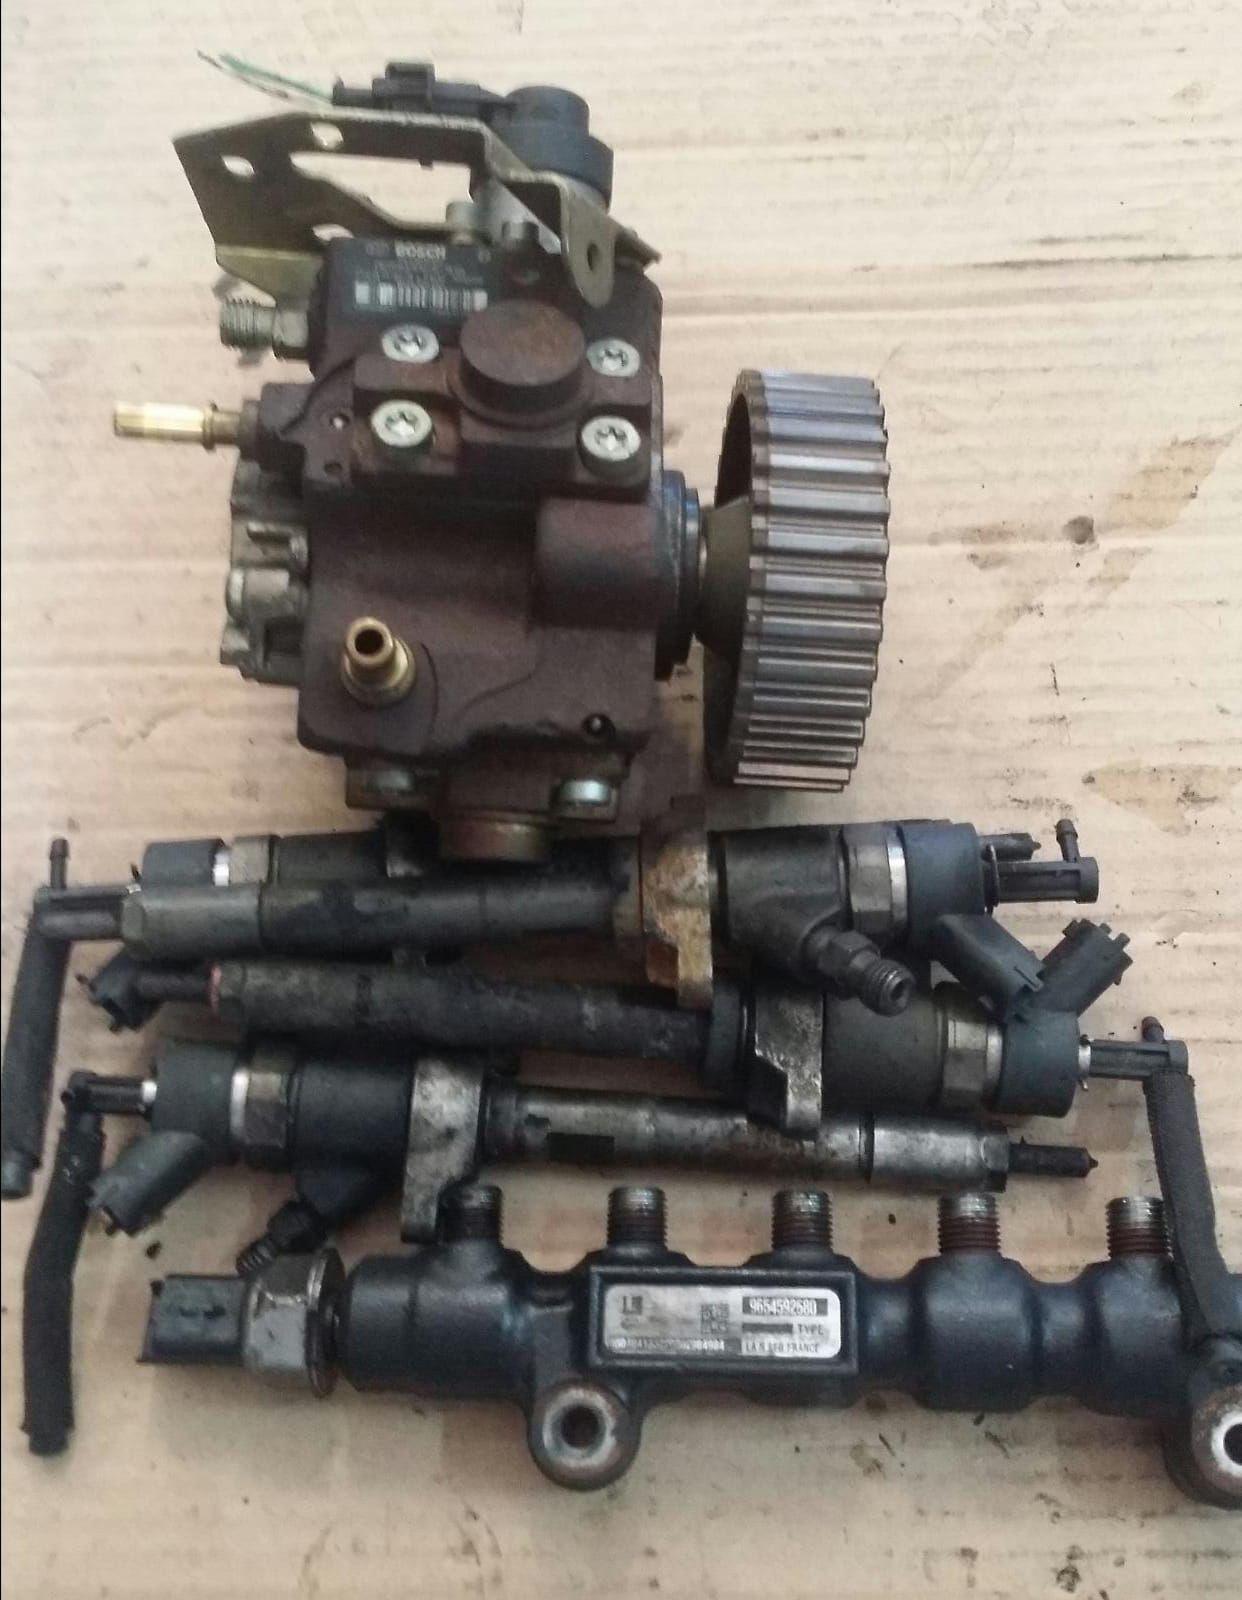 0445010102 KIT POMPA ED INIETTORI PEUGEOT 307 Berlina 2° Serie 1600 Diesel 9hz   (2006) RICAMBI USATI